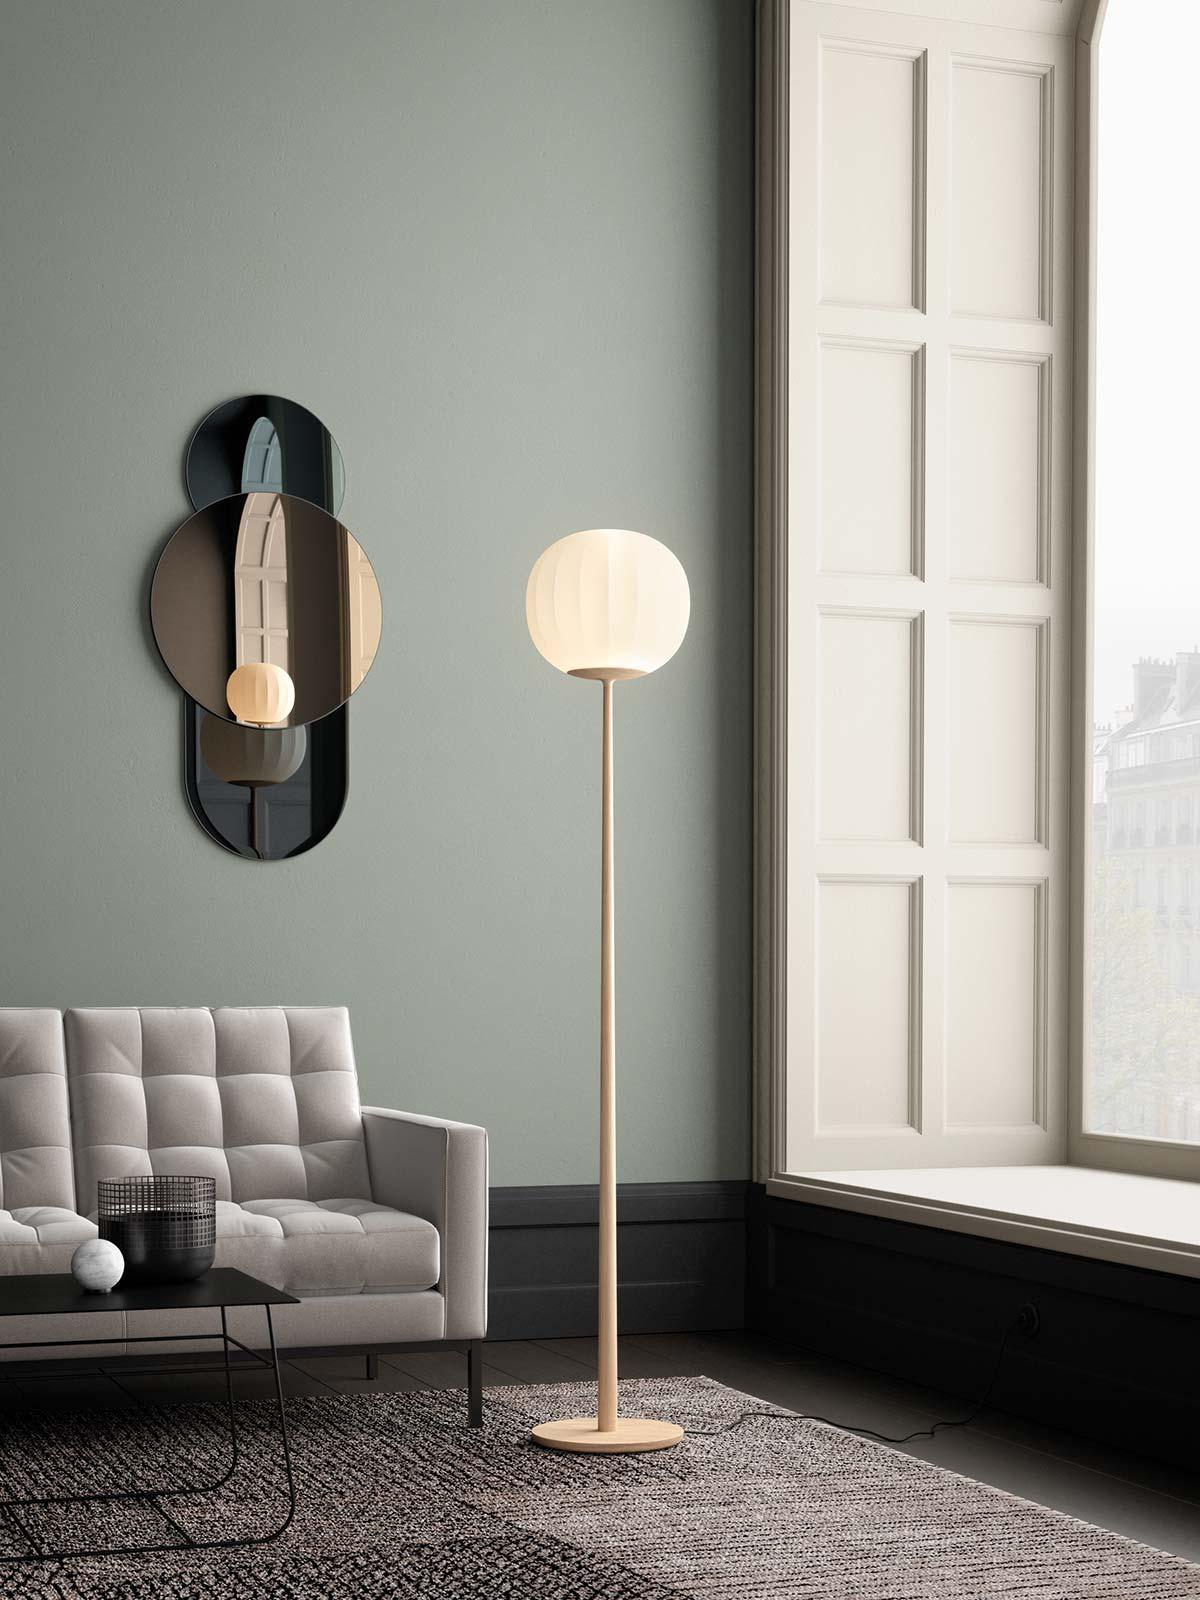 Lampada da terra Lita by Luceplan - Design David Dolcini